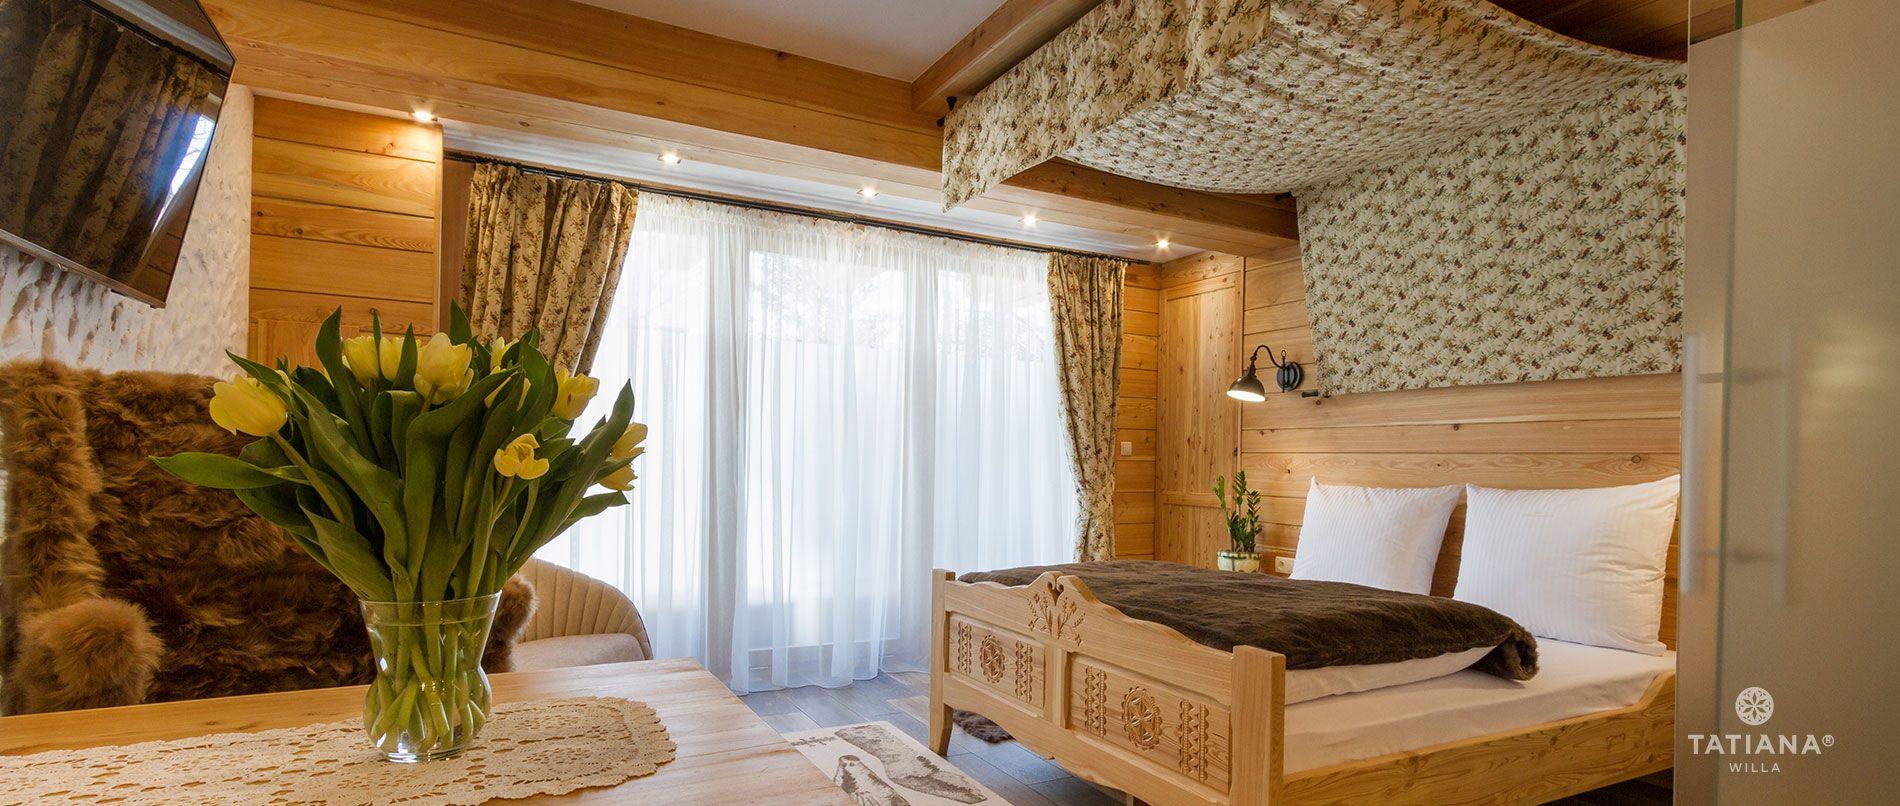 Larch Apartment- leisure/sleeping part